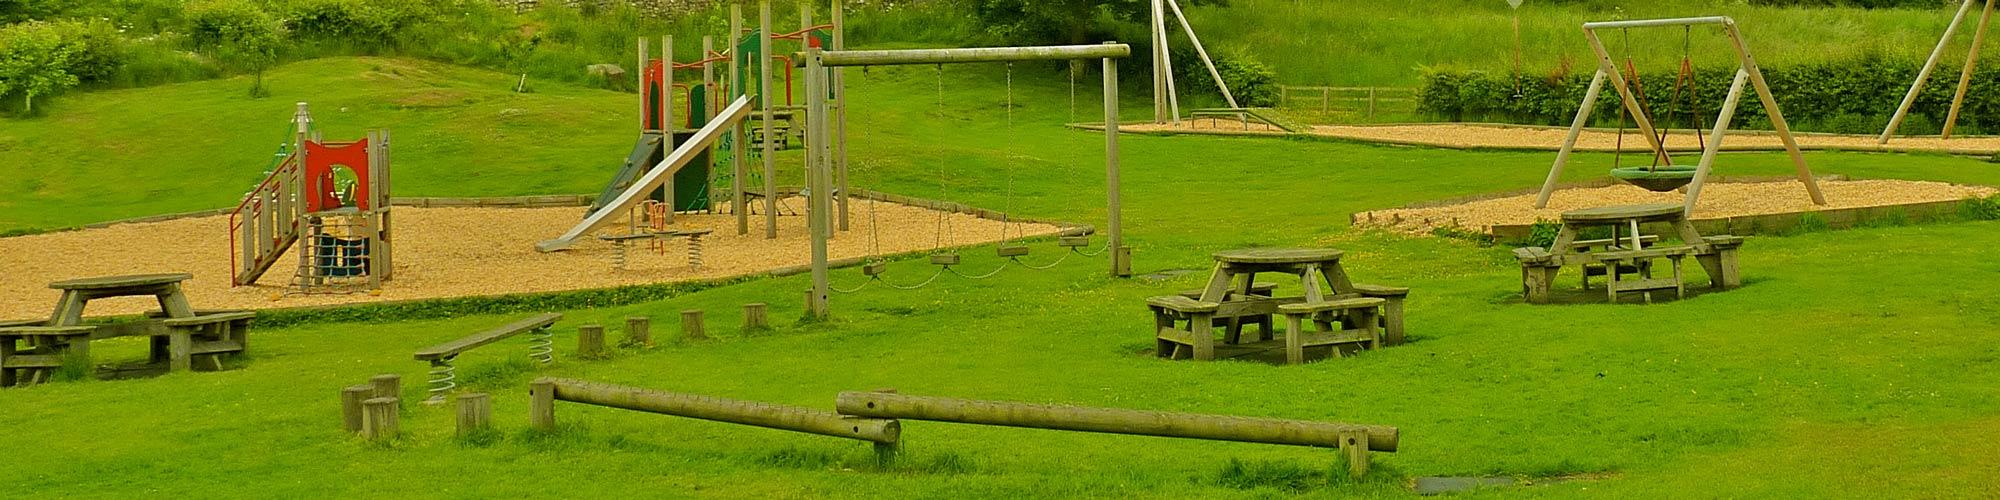 The Playground at PoppyCottage